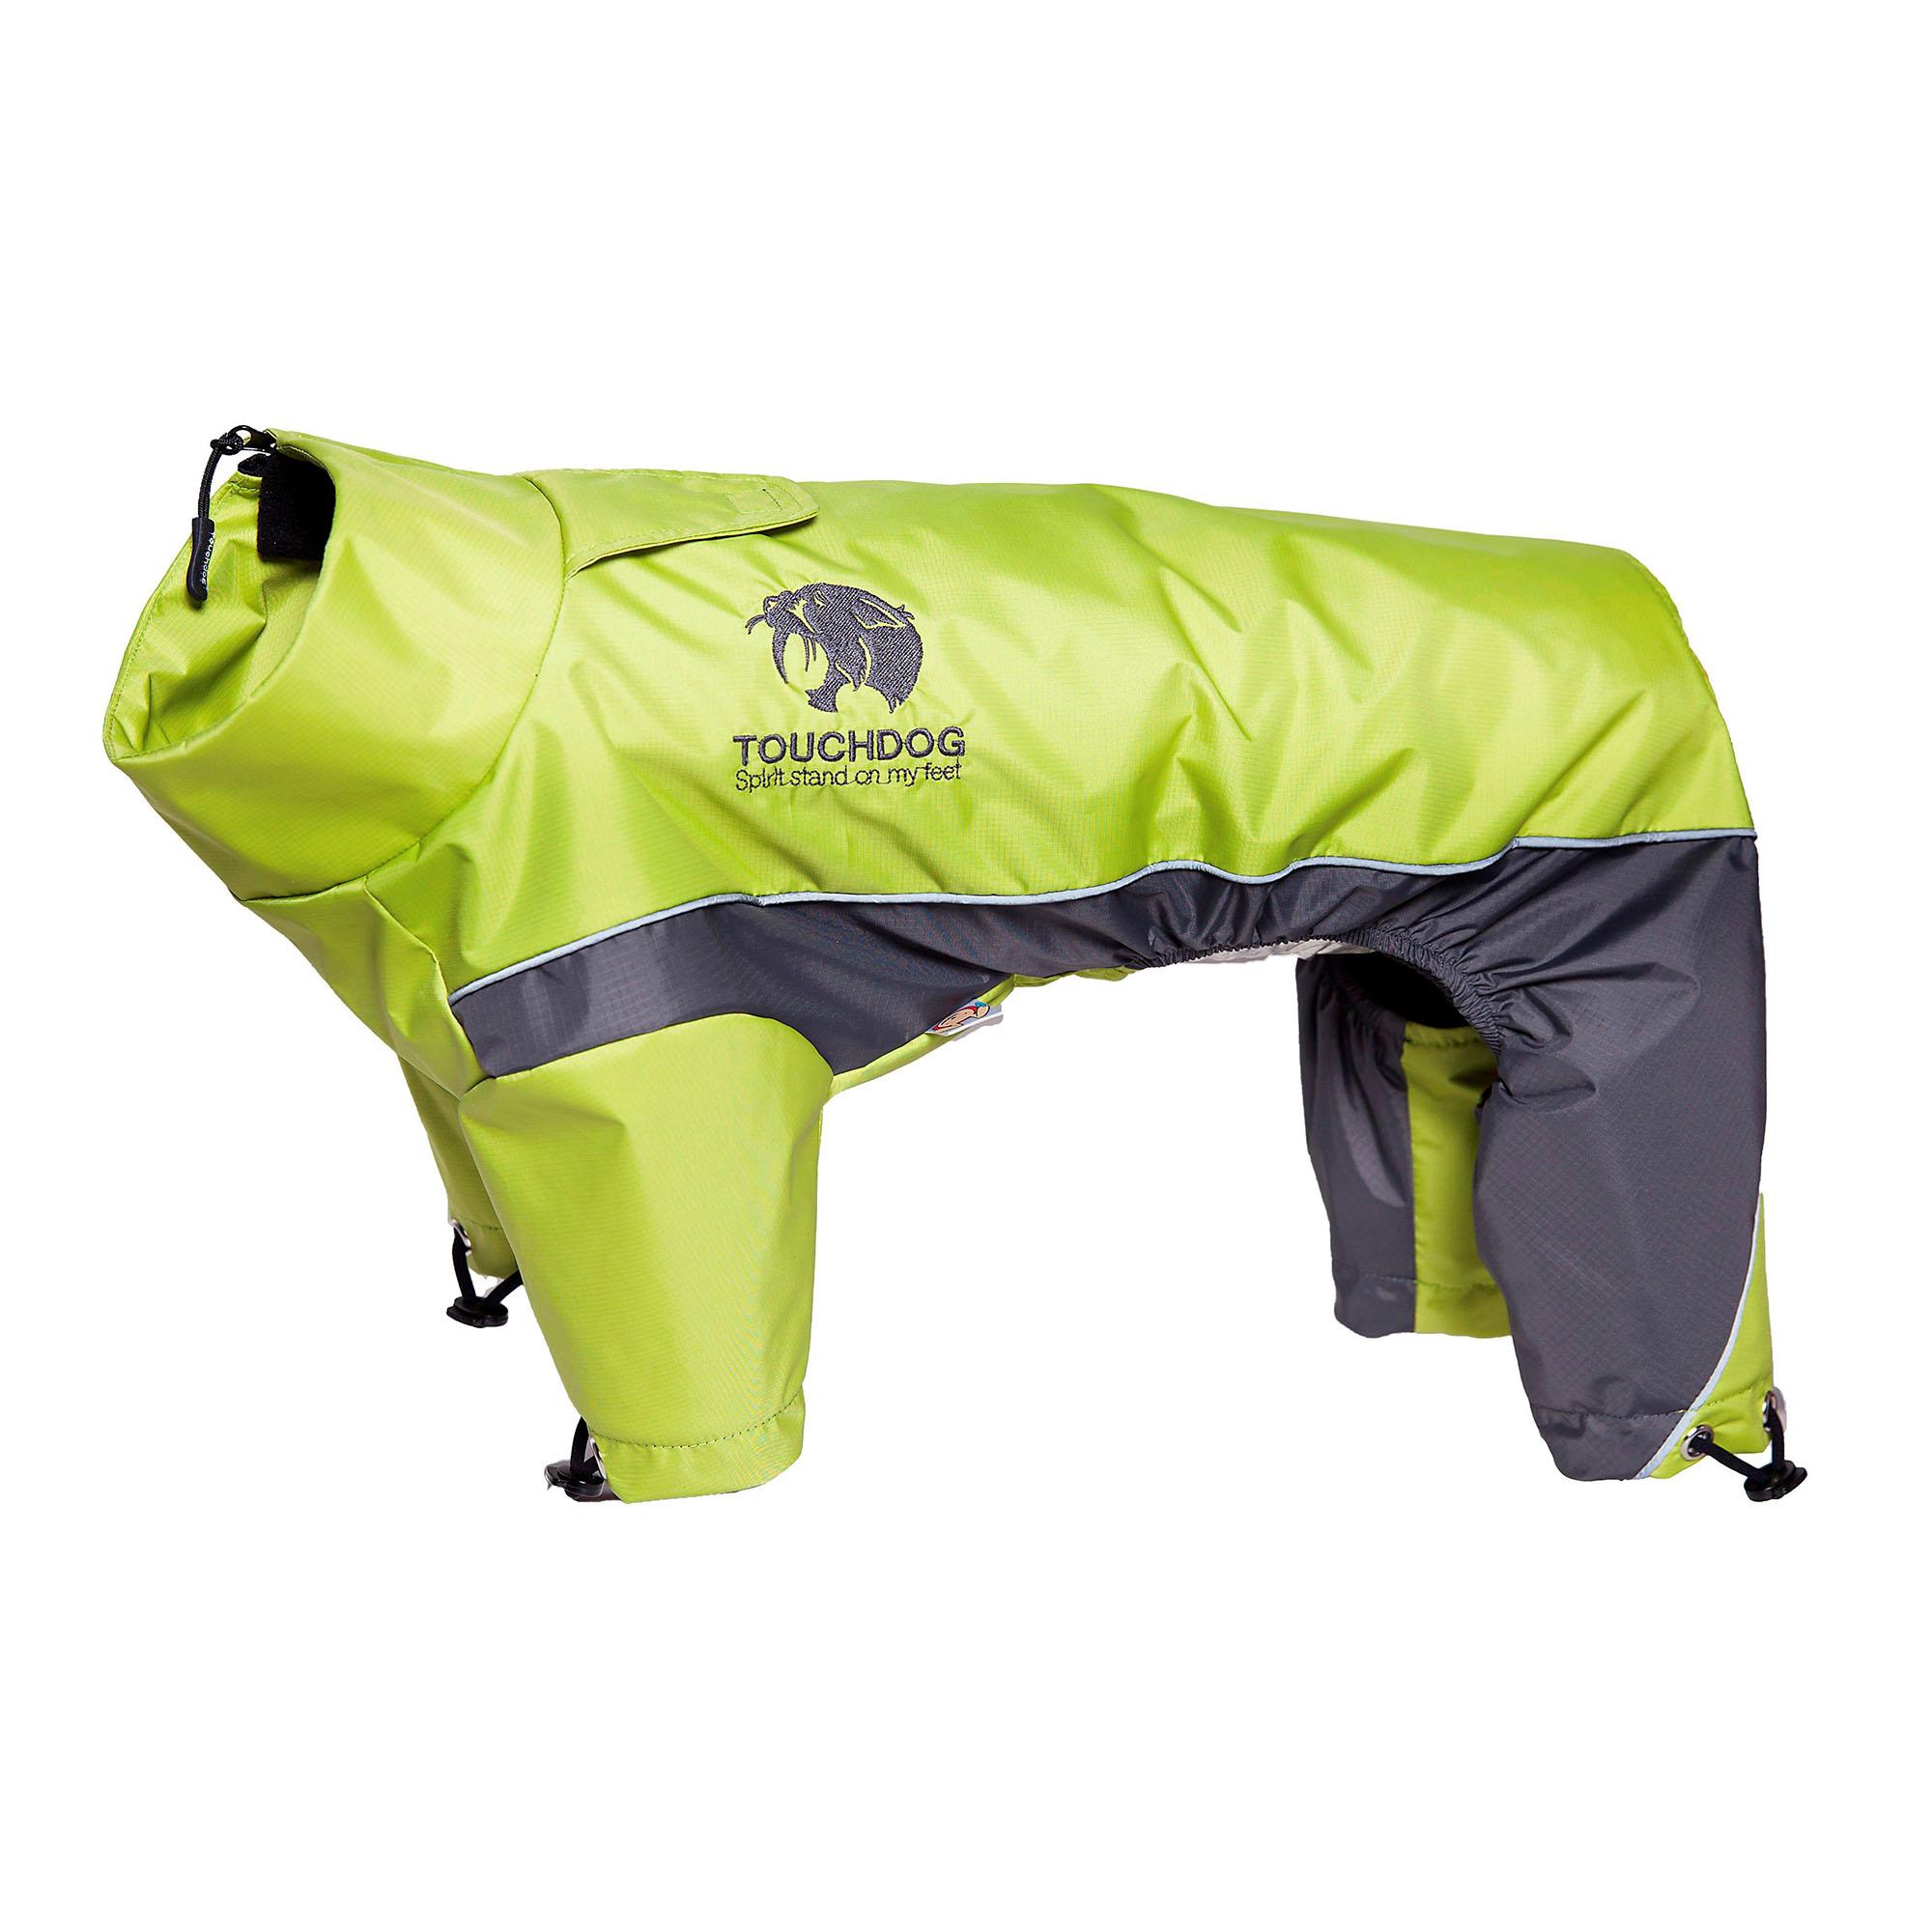 Touchdog Quantum-Ice Full-Bodied Adjustable and 3M Reflective Dog Jacket w/ Blackshark Technology, Light Yellow-Grey X-Large (812131035260 Lifestyle Pet Pet Apparel T-Shirts & Jackets) photo